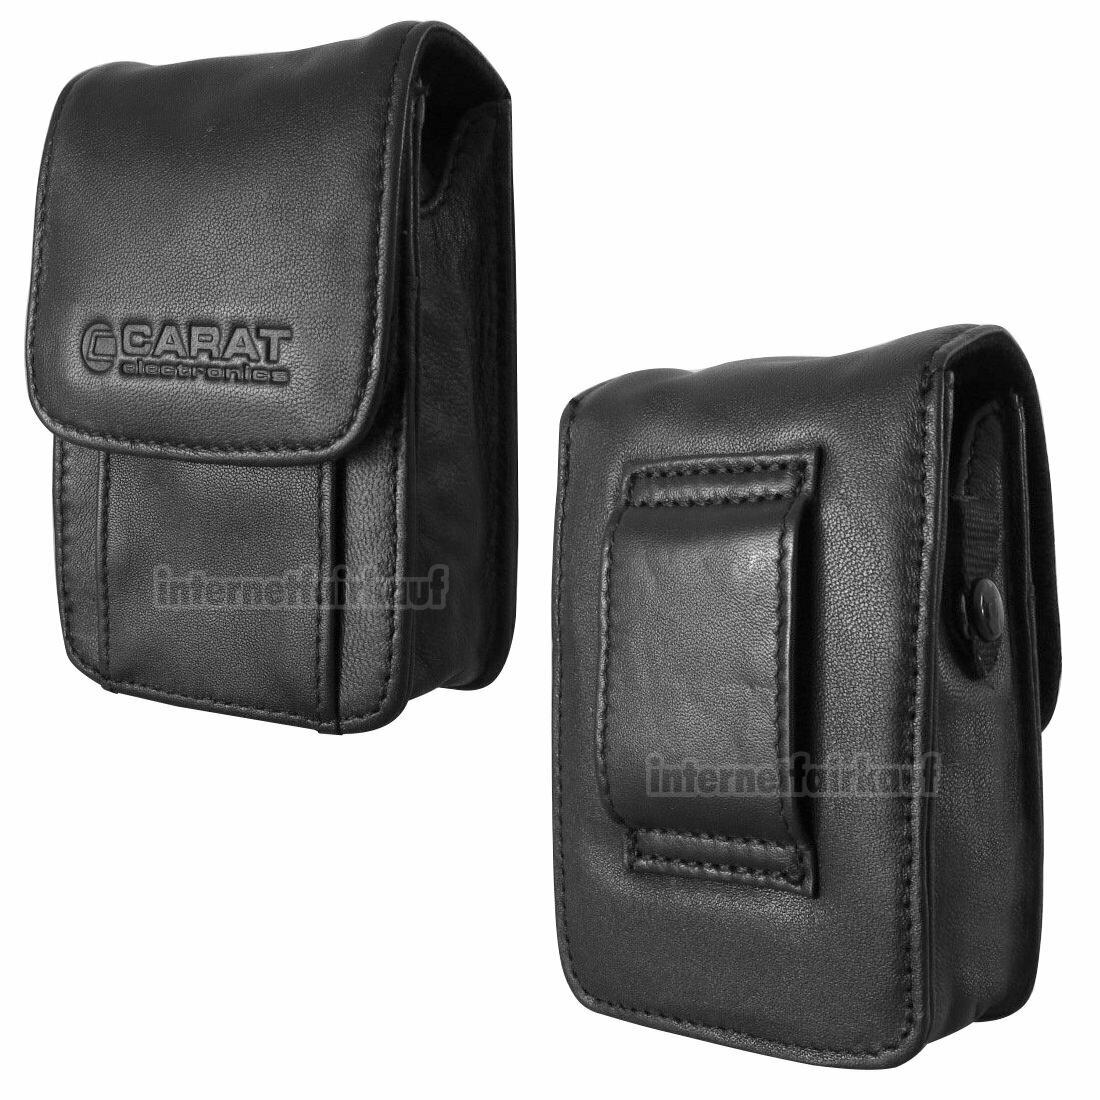 Tasche passend für Nikon Coolpix L21 L22 L23  - Leder Etui Fototasche